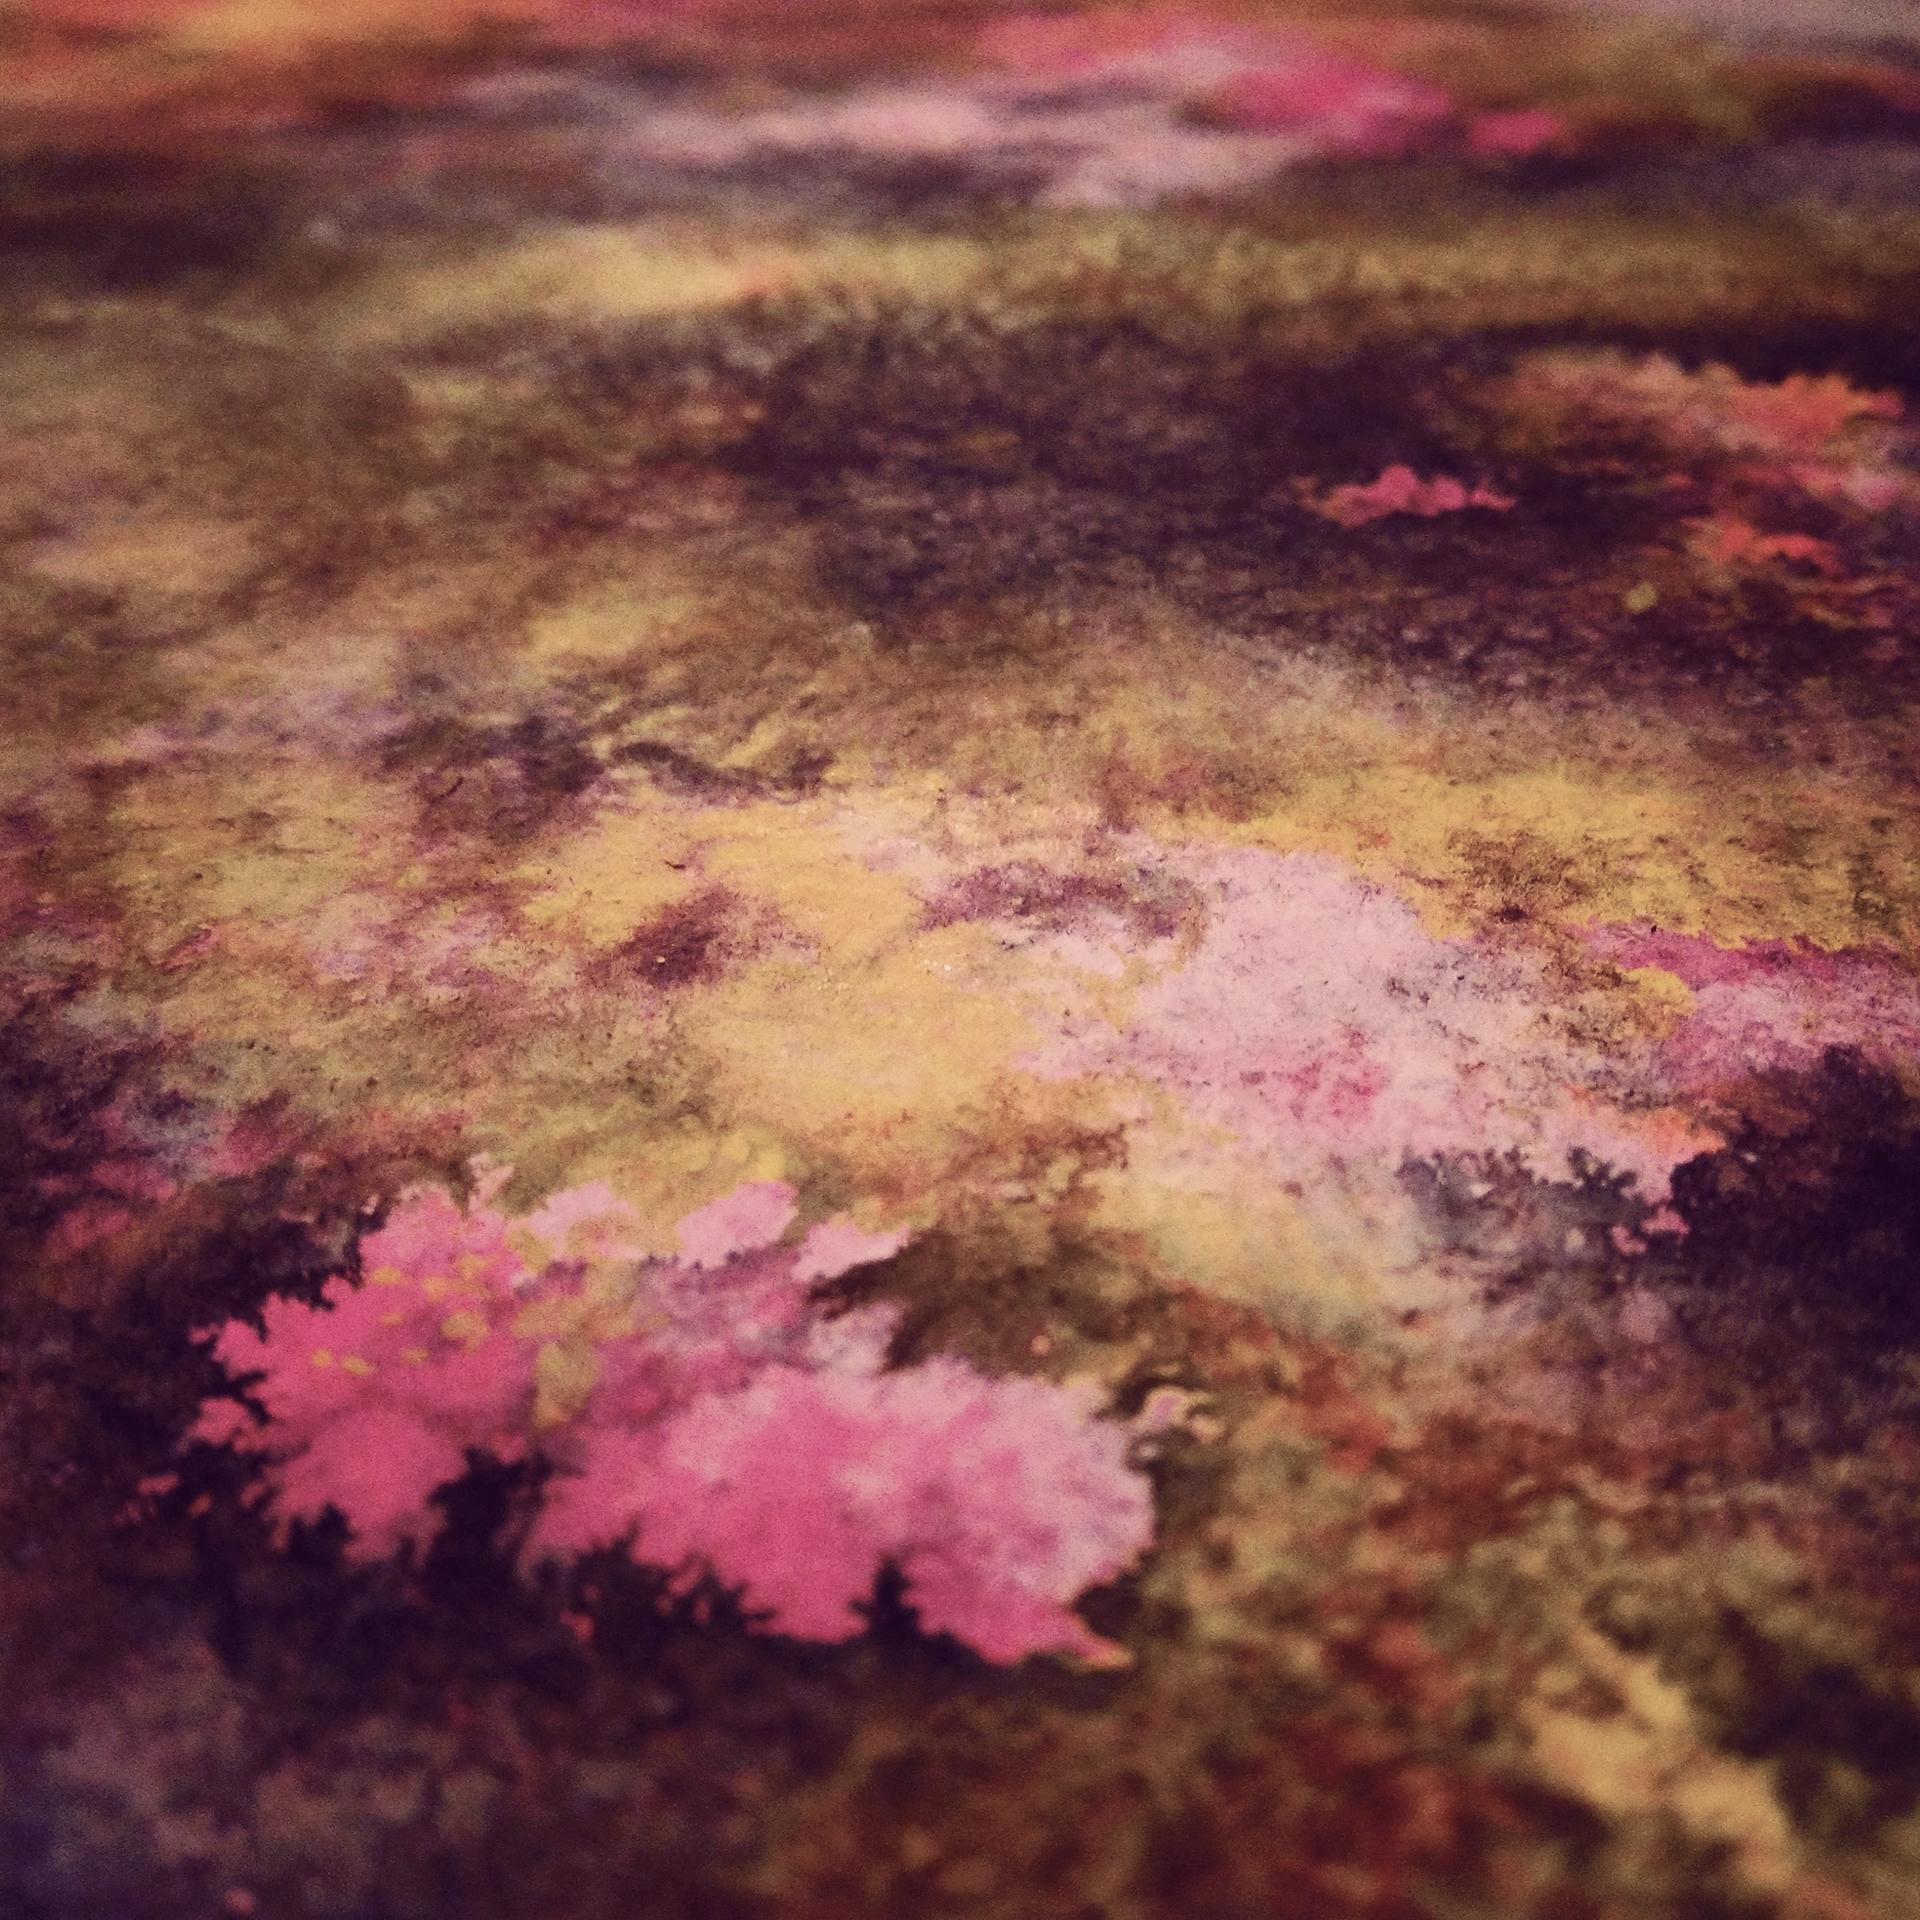 bonjourmolotov Dust Illustration Ilustracao painting pintura acrylic acrílico canvas tela paper cardboard mdf Andre Gigante 03N2.jpg